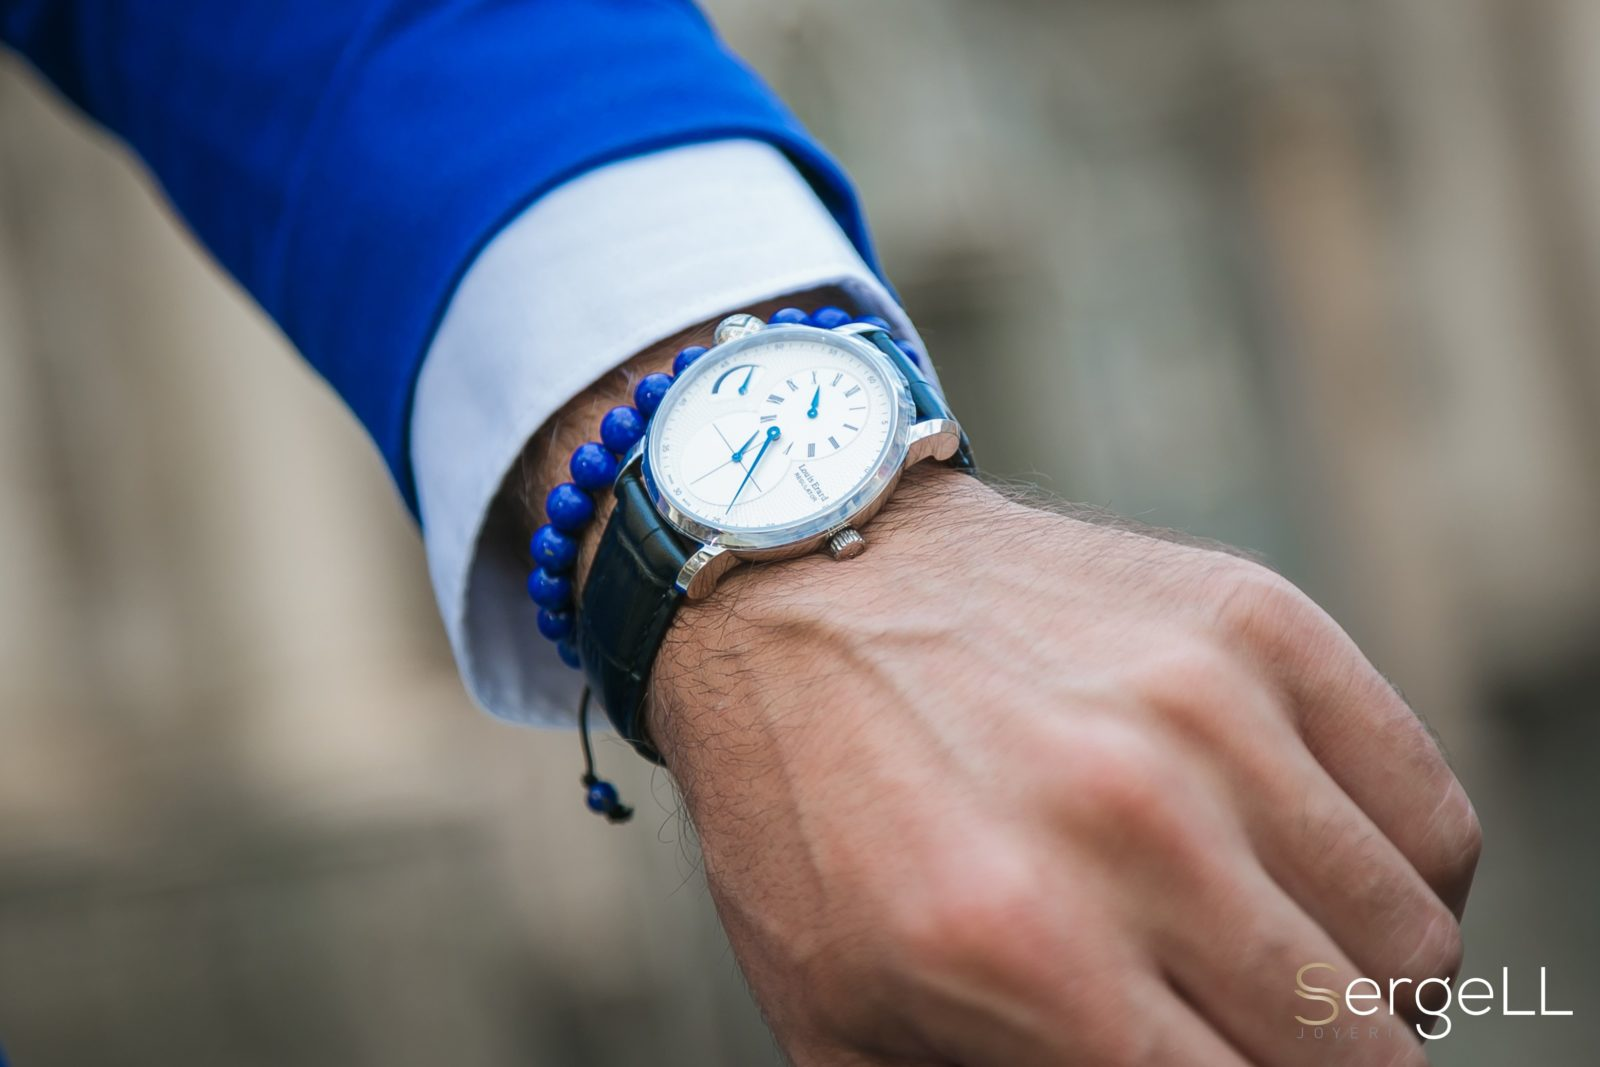 Sergell, Joyeria Sergell, Joyeria Murcia, Joyeria hombre, Reloj Louis Erard, Reloj hombre, Relojes hombre, Reloj moderno, Reloj vintage, Reloj diseño, Louis Erard Murcia, Louis Erard España, web relojes, online relojes